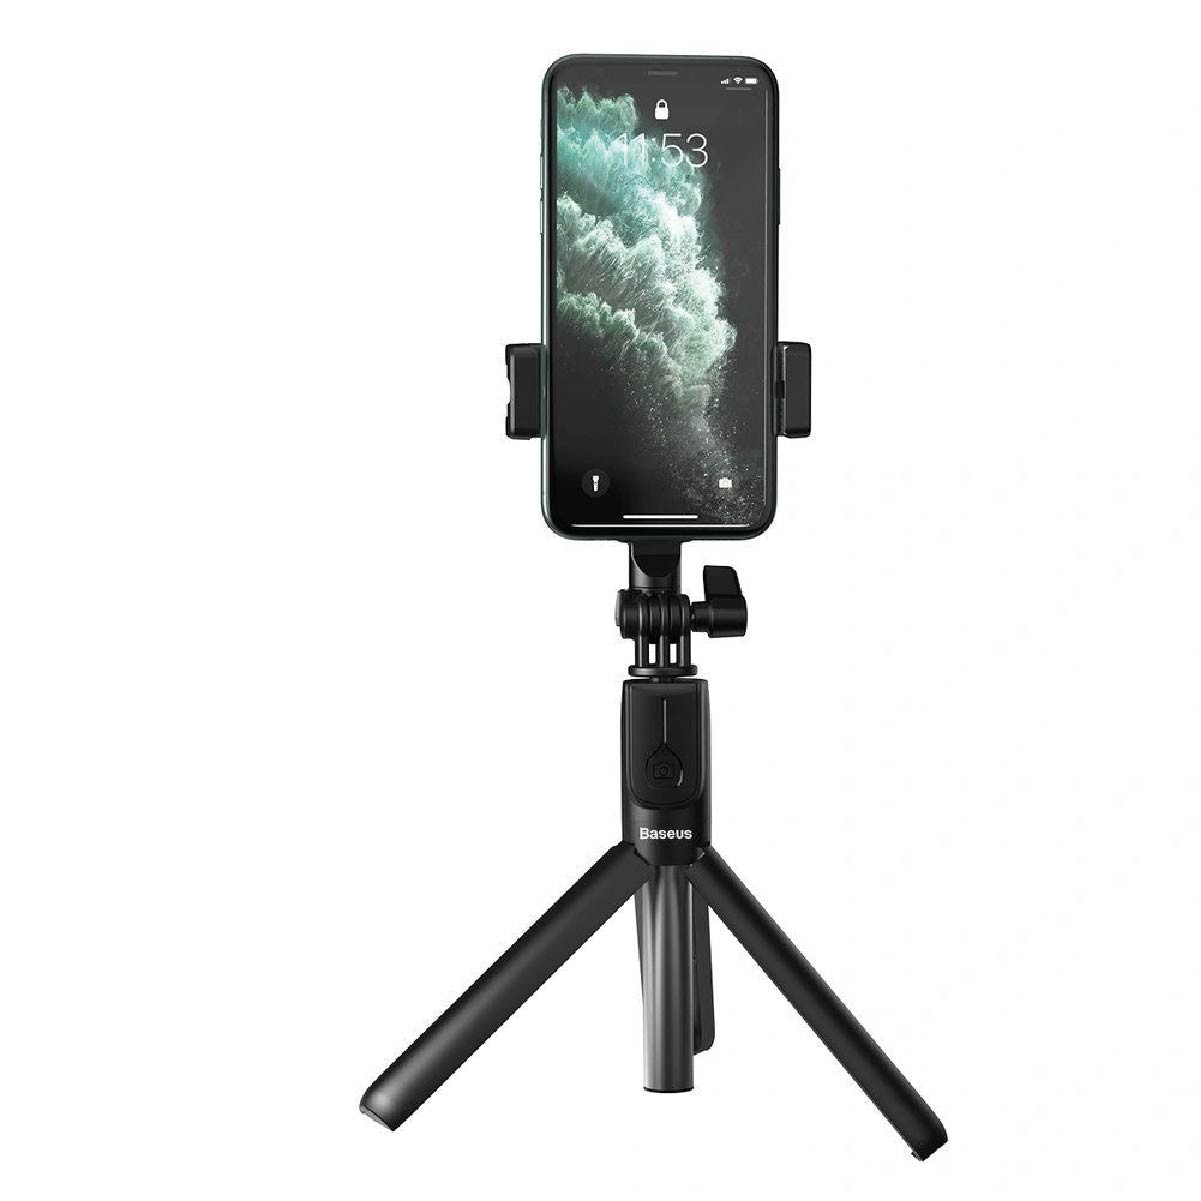 Bastao de Selfie Baseus Lovely Bluetooth Preto (Ref. SUDYZP-F01)